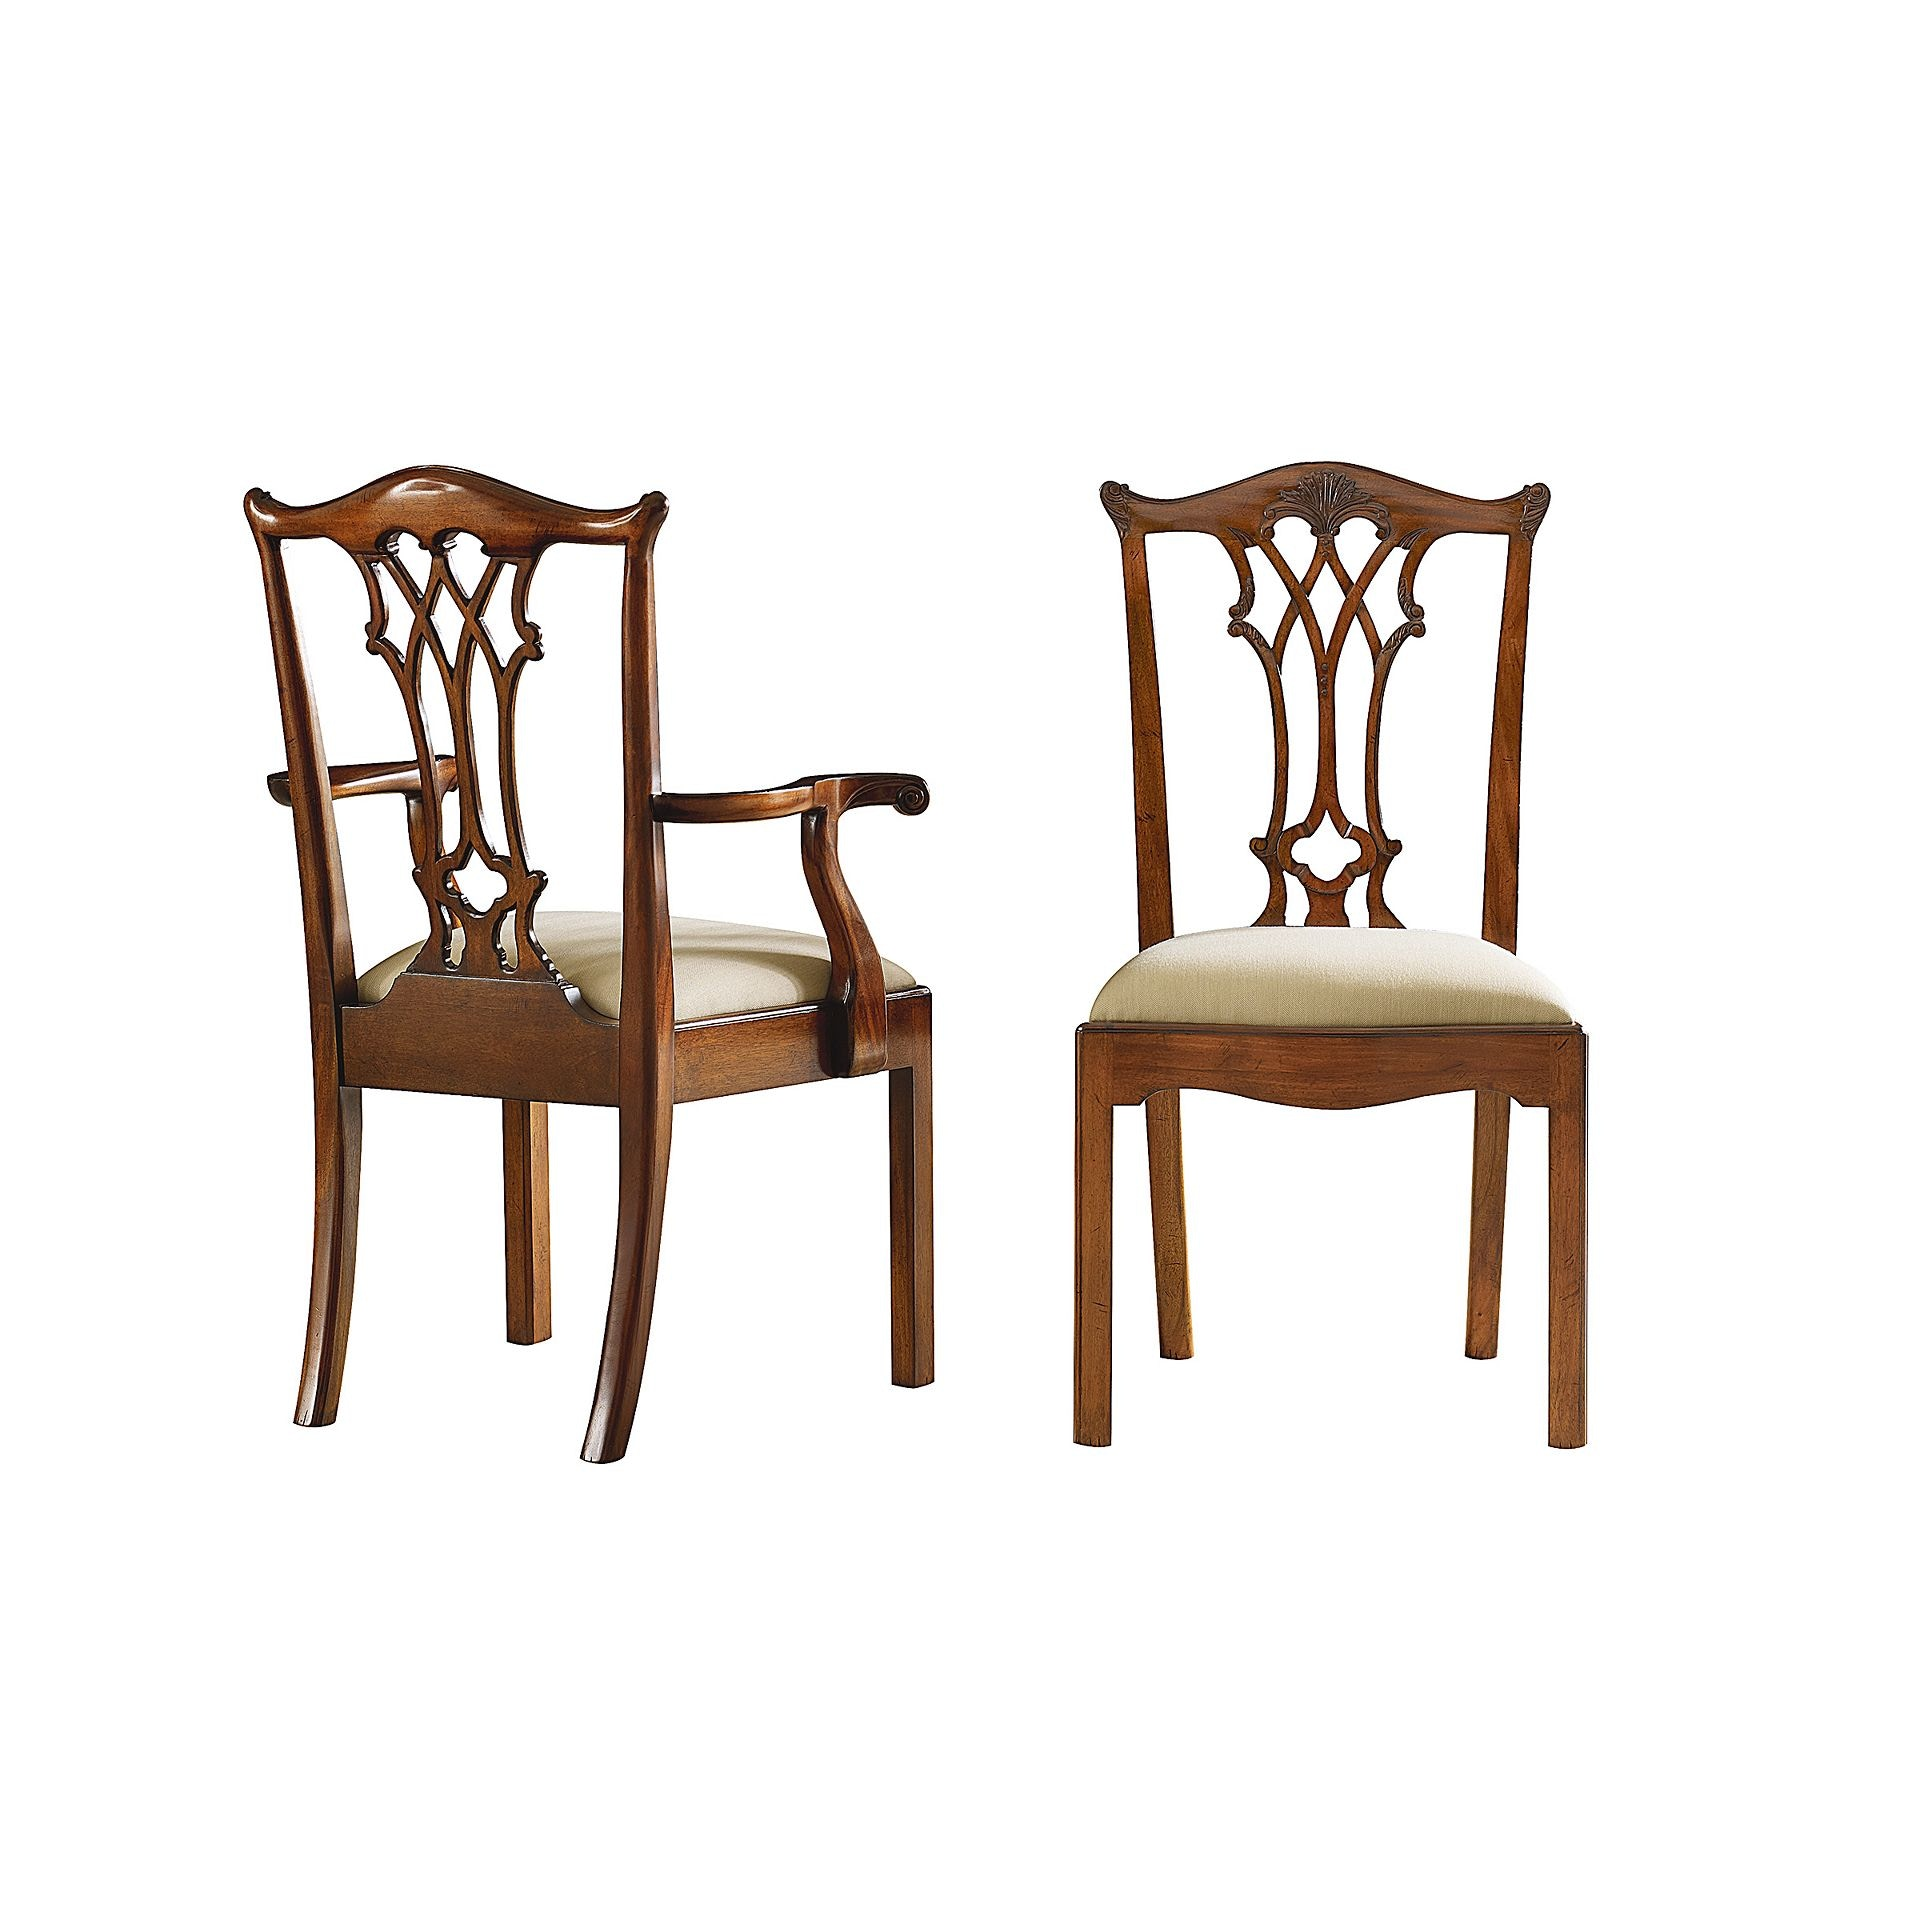 Henredon Furniture Aston Court Arm Chair 9600 27